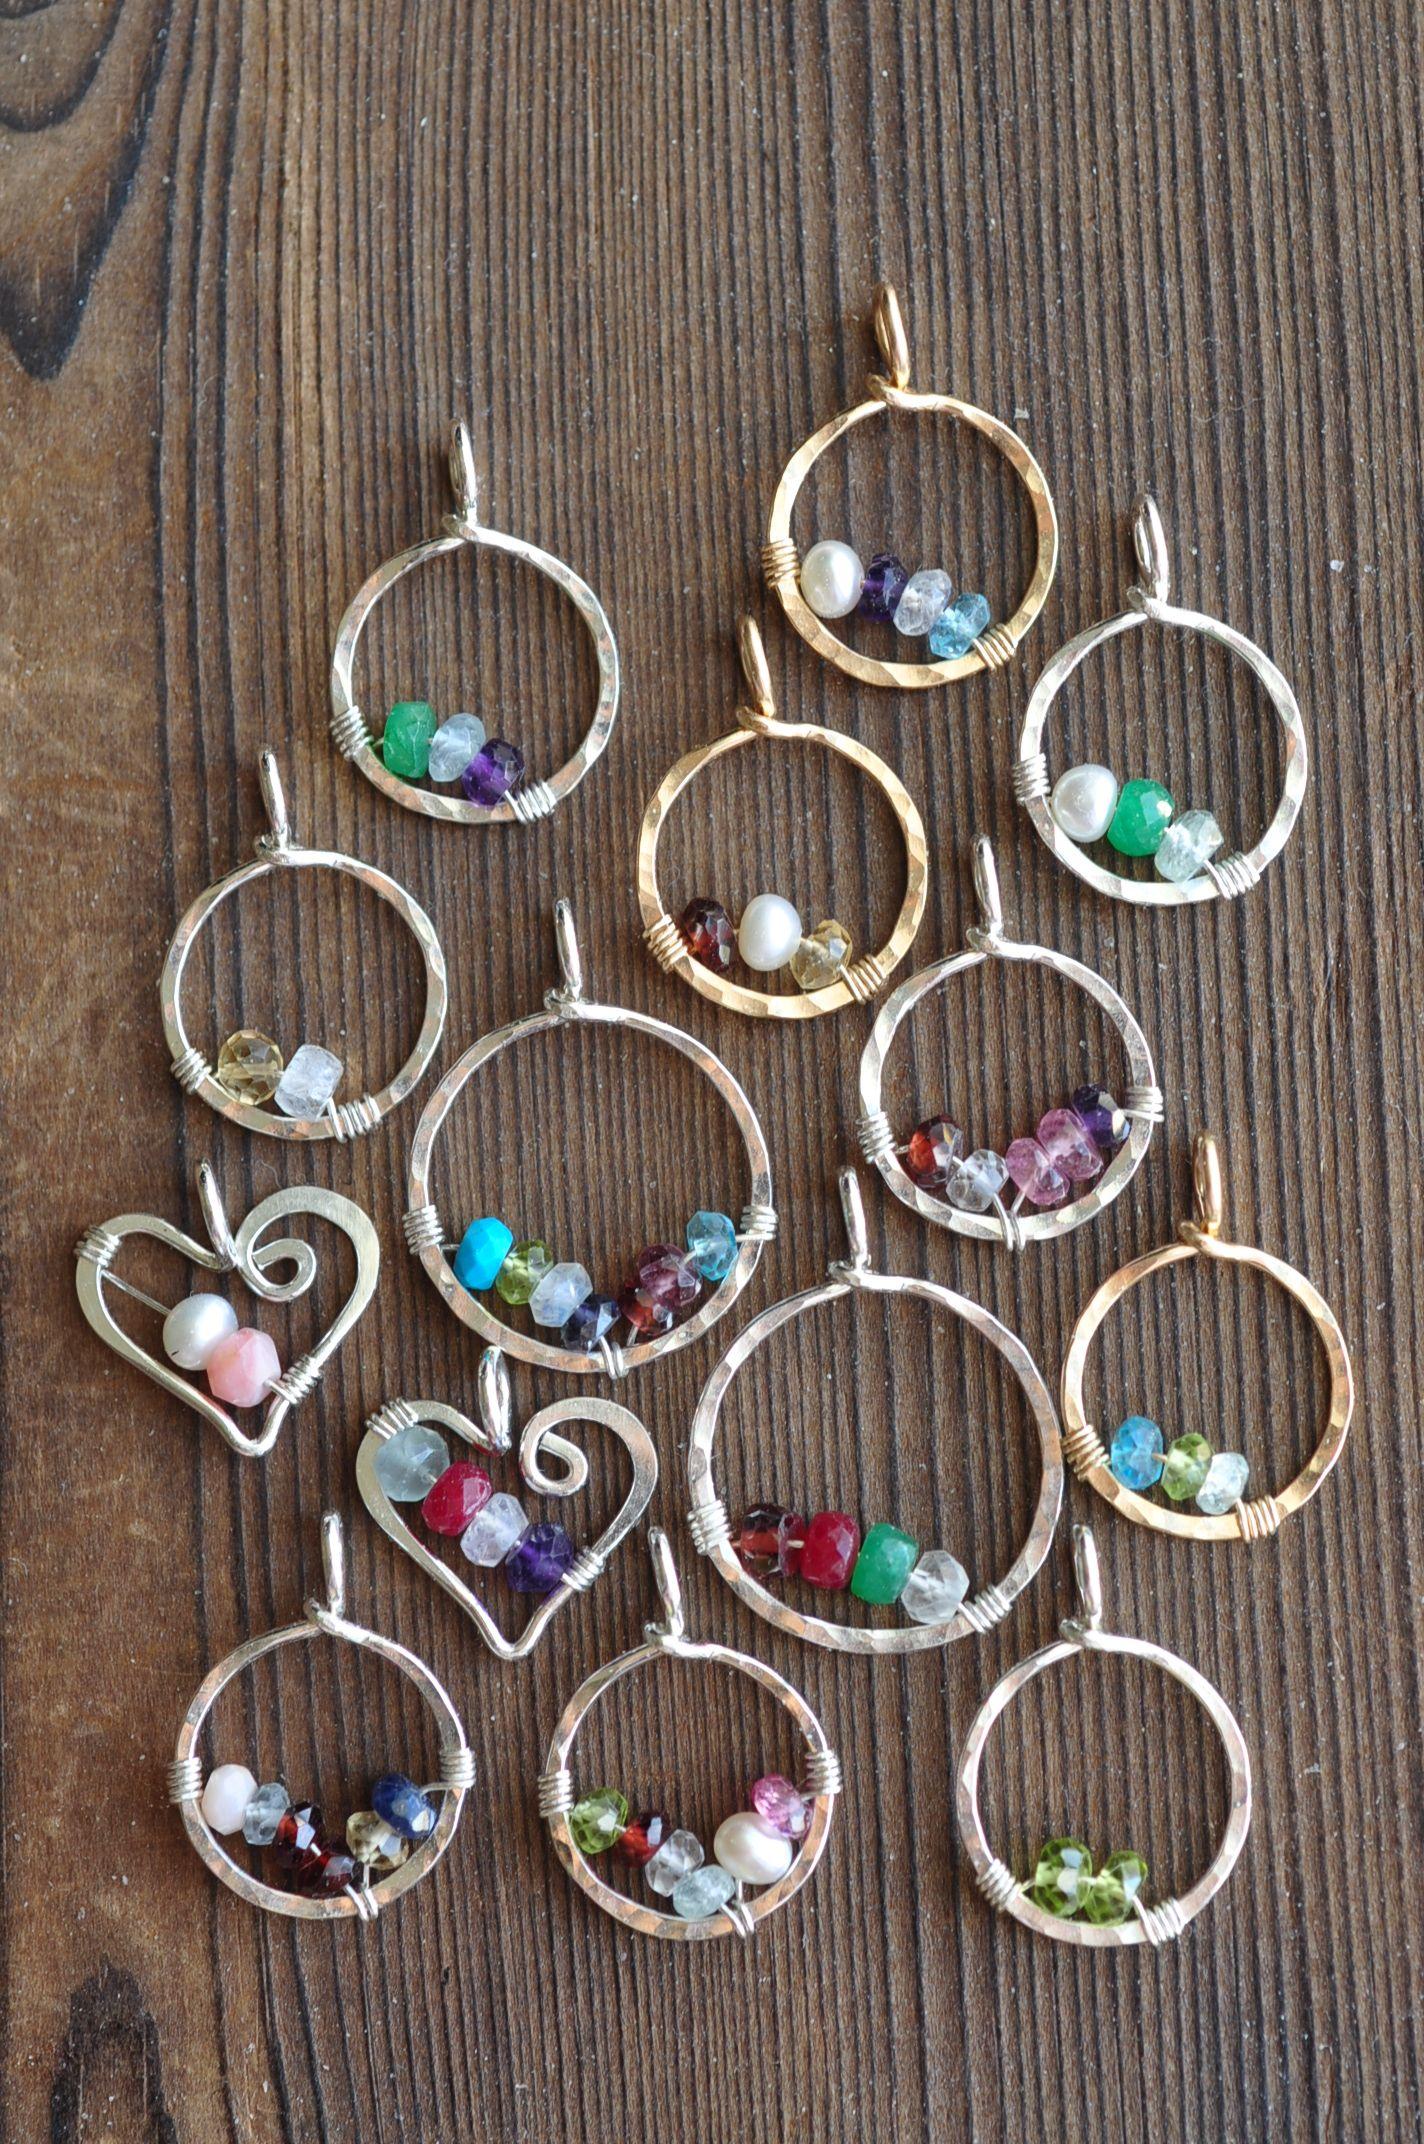 d8700c46d birthstone pendants for mom | Mu-Yin Jewelry | Full Time Etsy ...